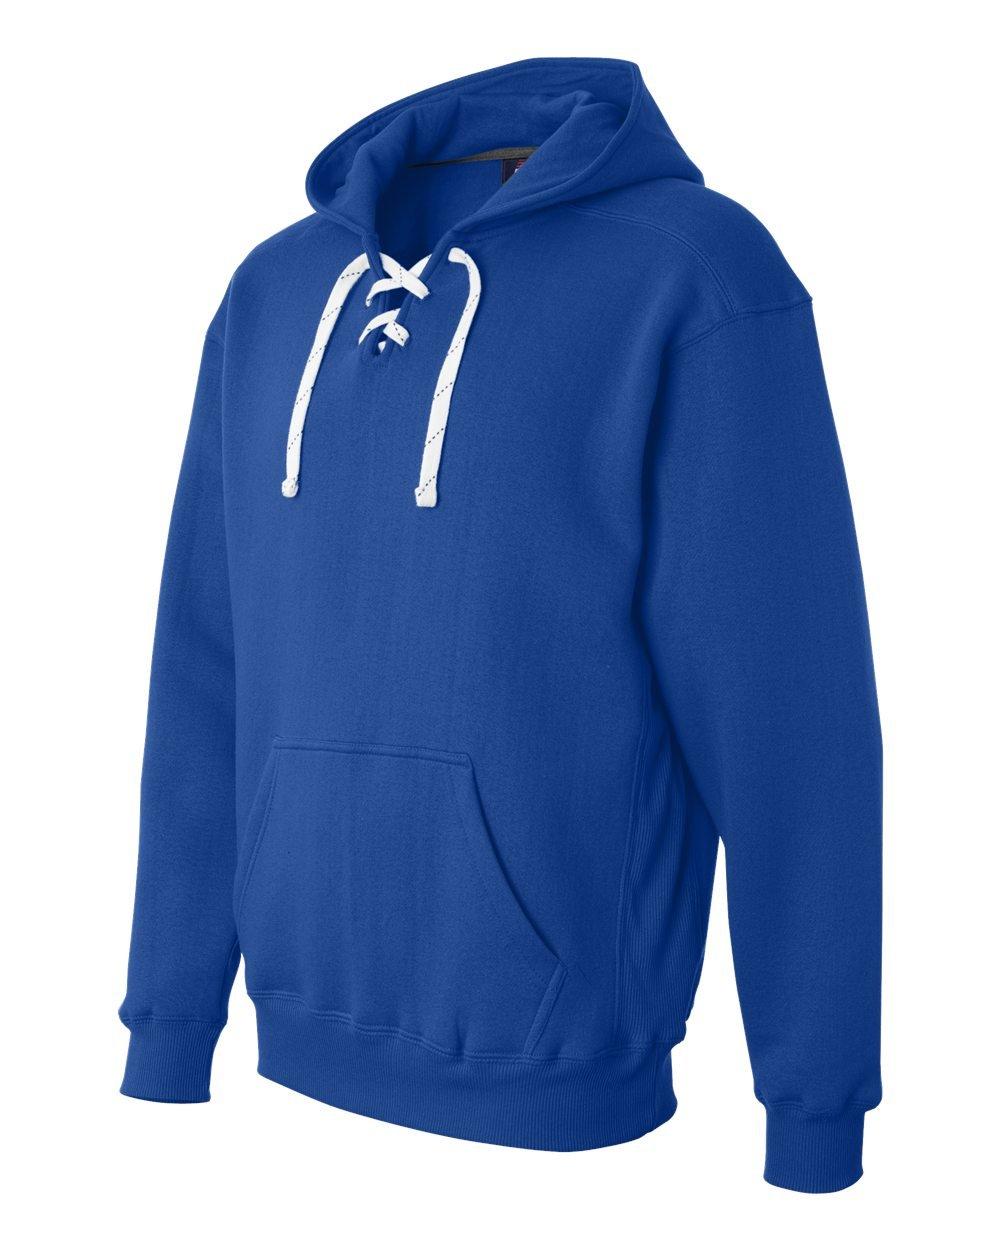 Blue Hockey Hood Sweatshirt: 80% Ringspun Cotton, 20% Polyester Fleece Fabric.,Royal Blue,X-Large